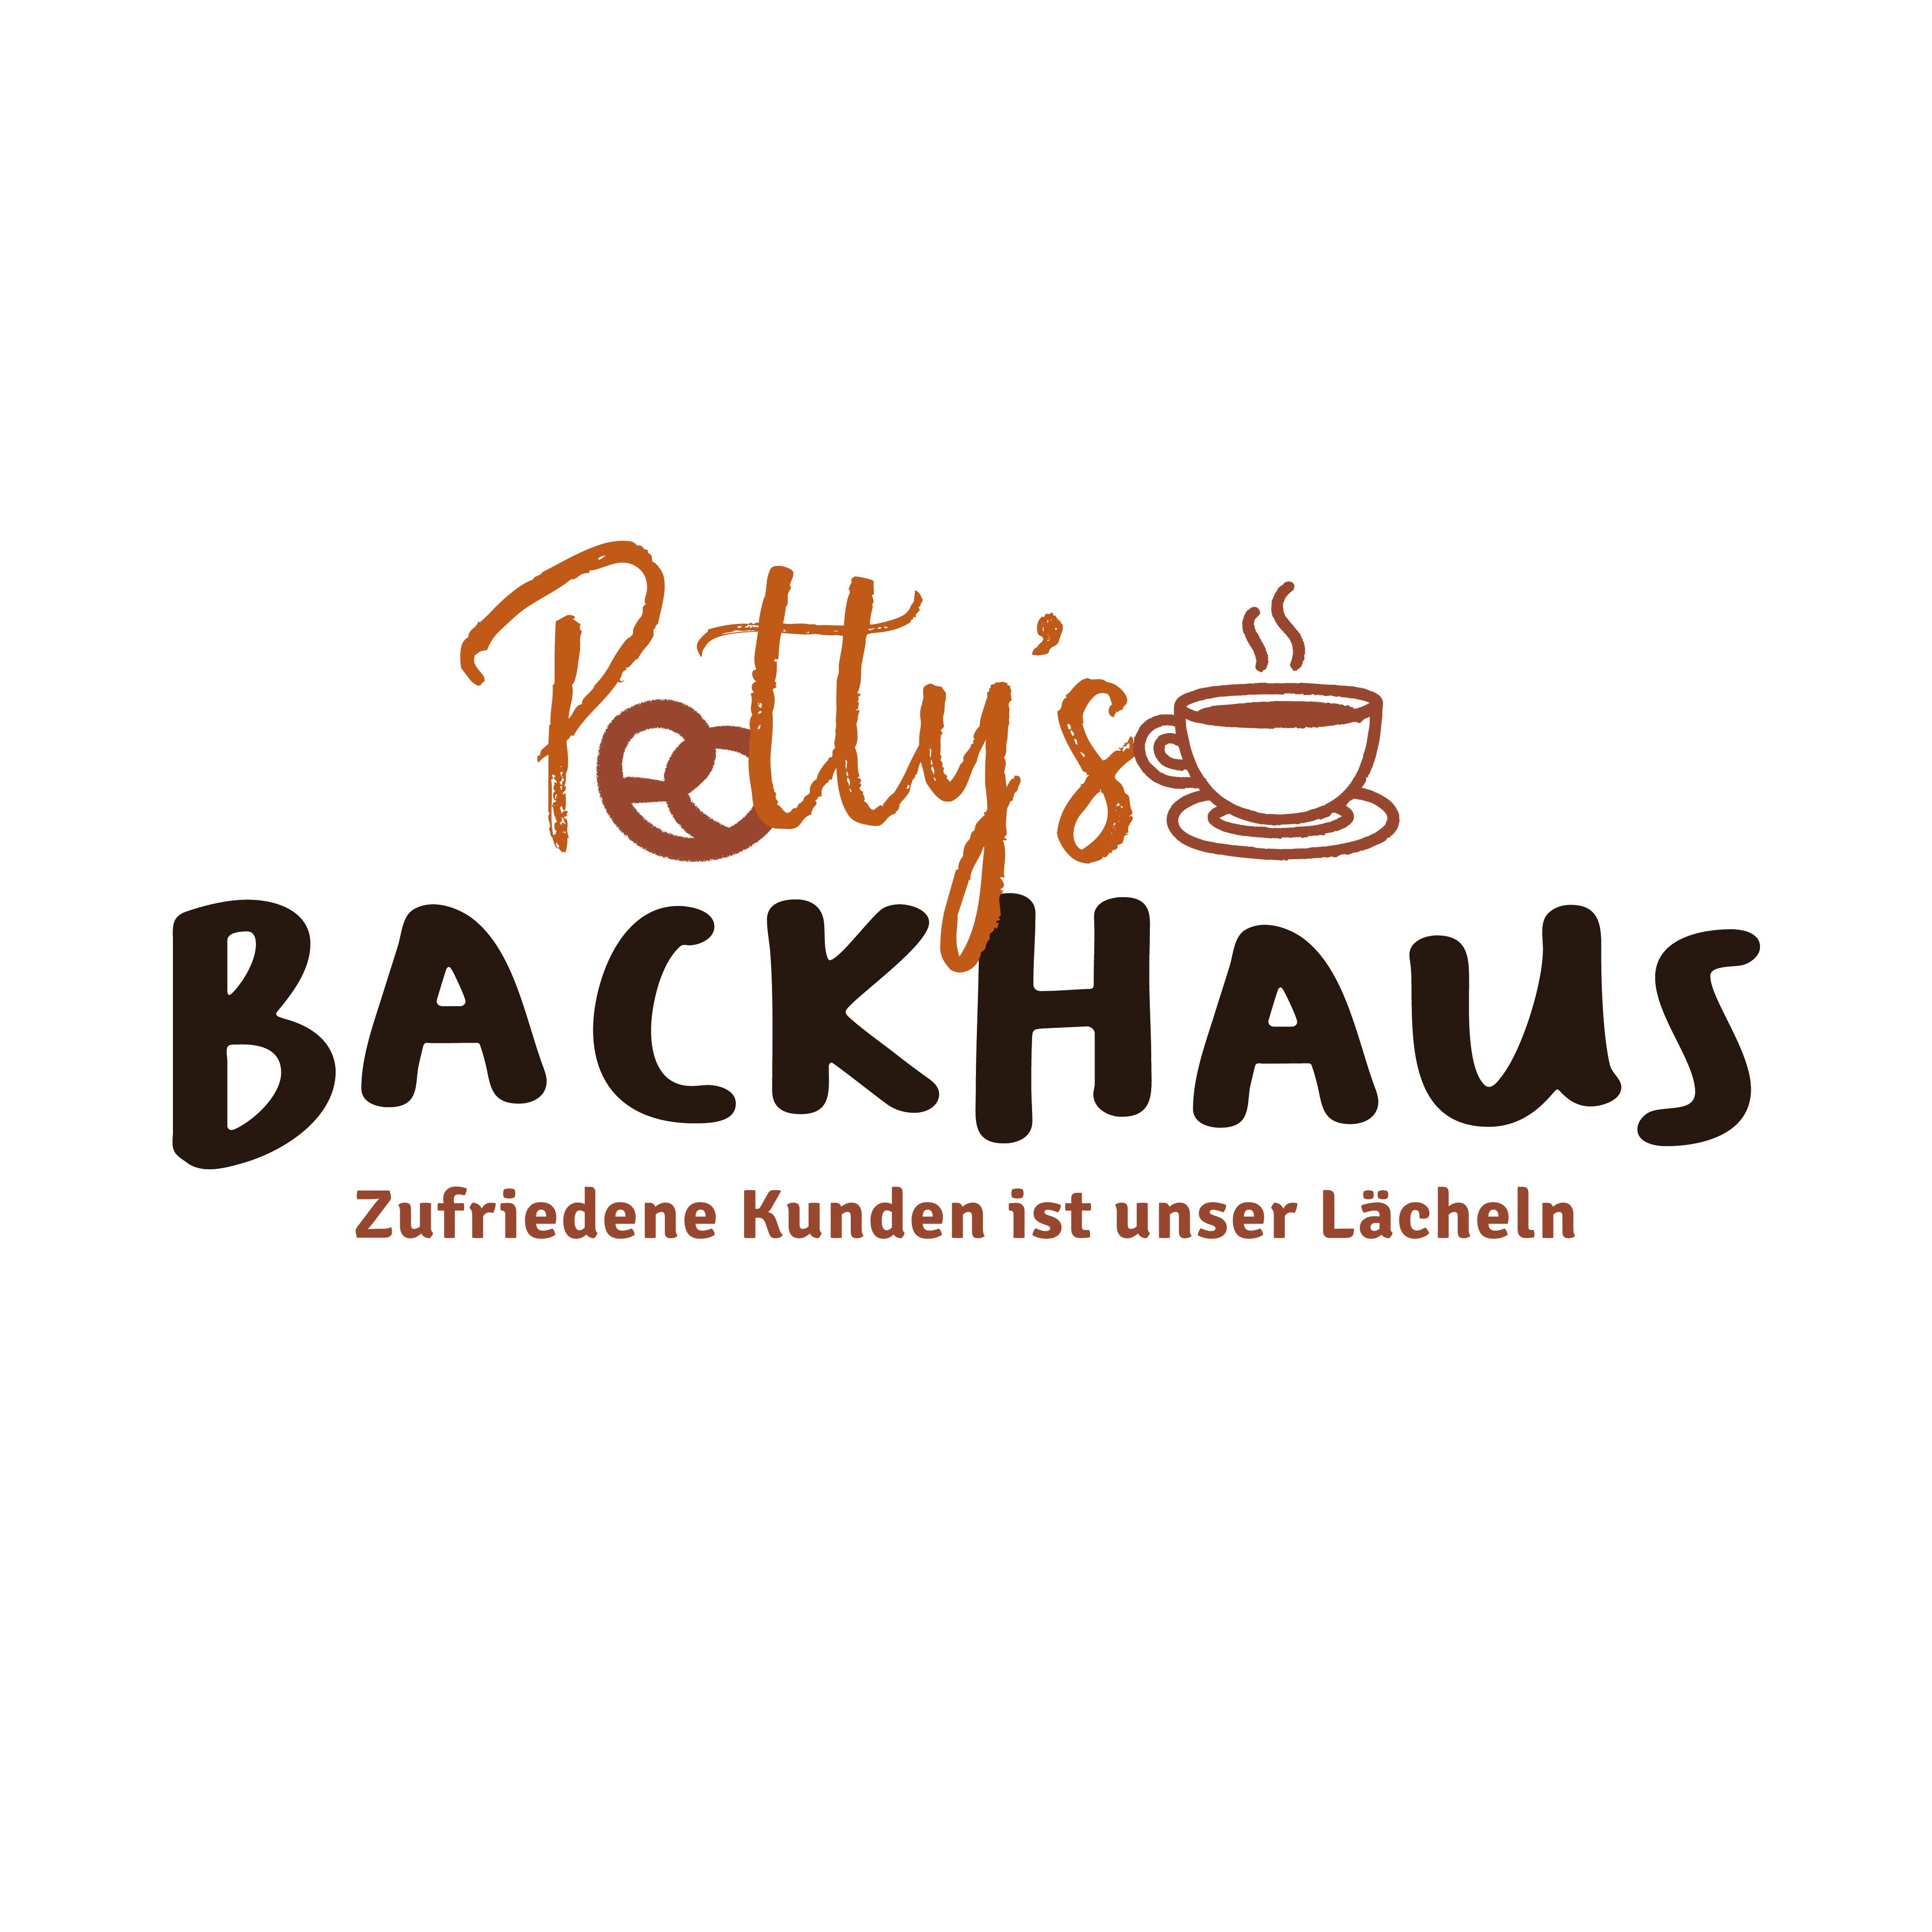 New modern professional logo design needed for a bakery! / Logo gesucht für Bäckerei